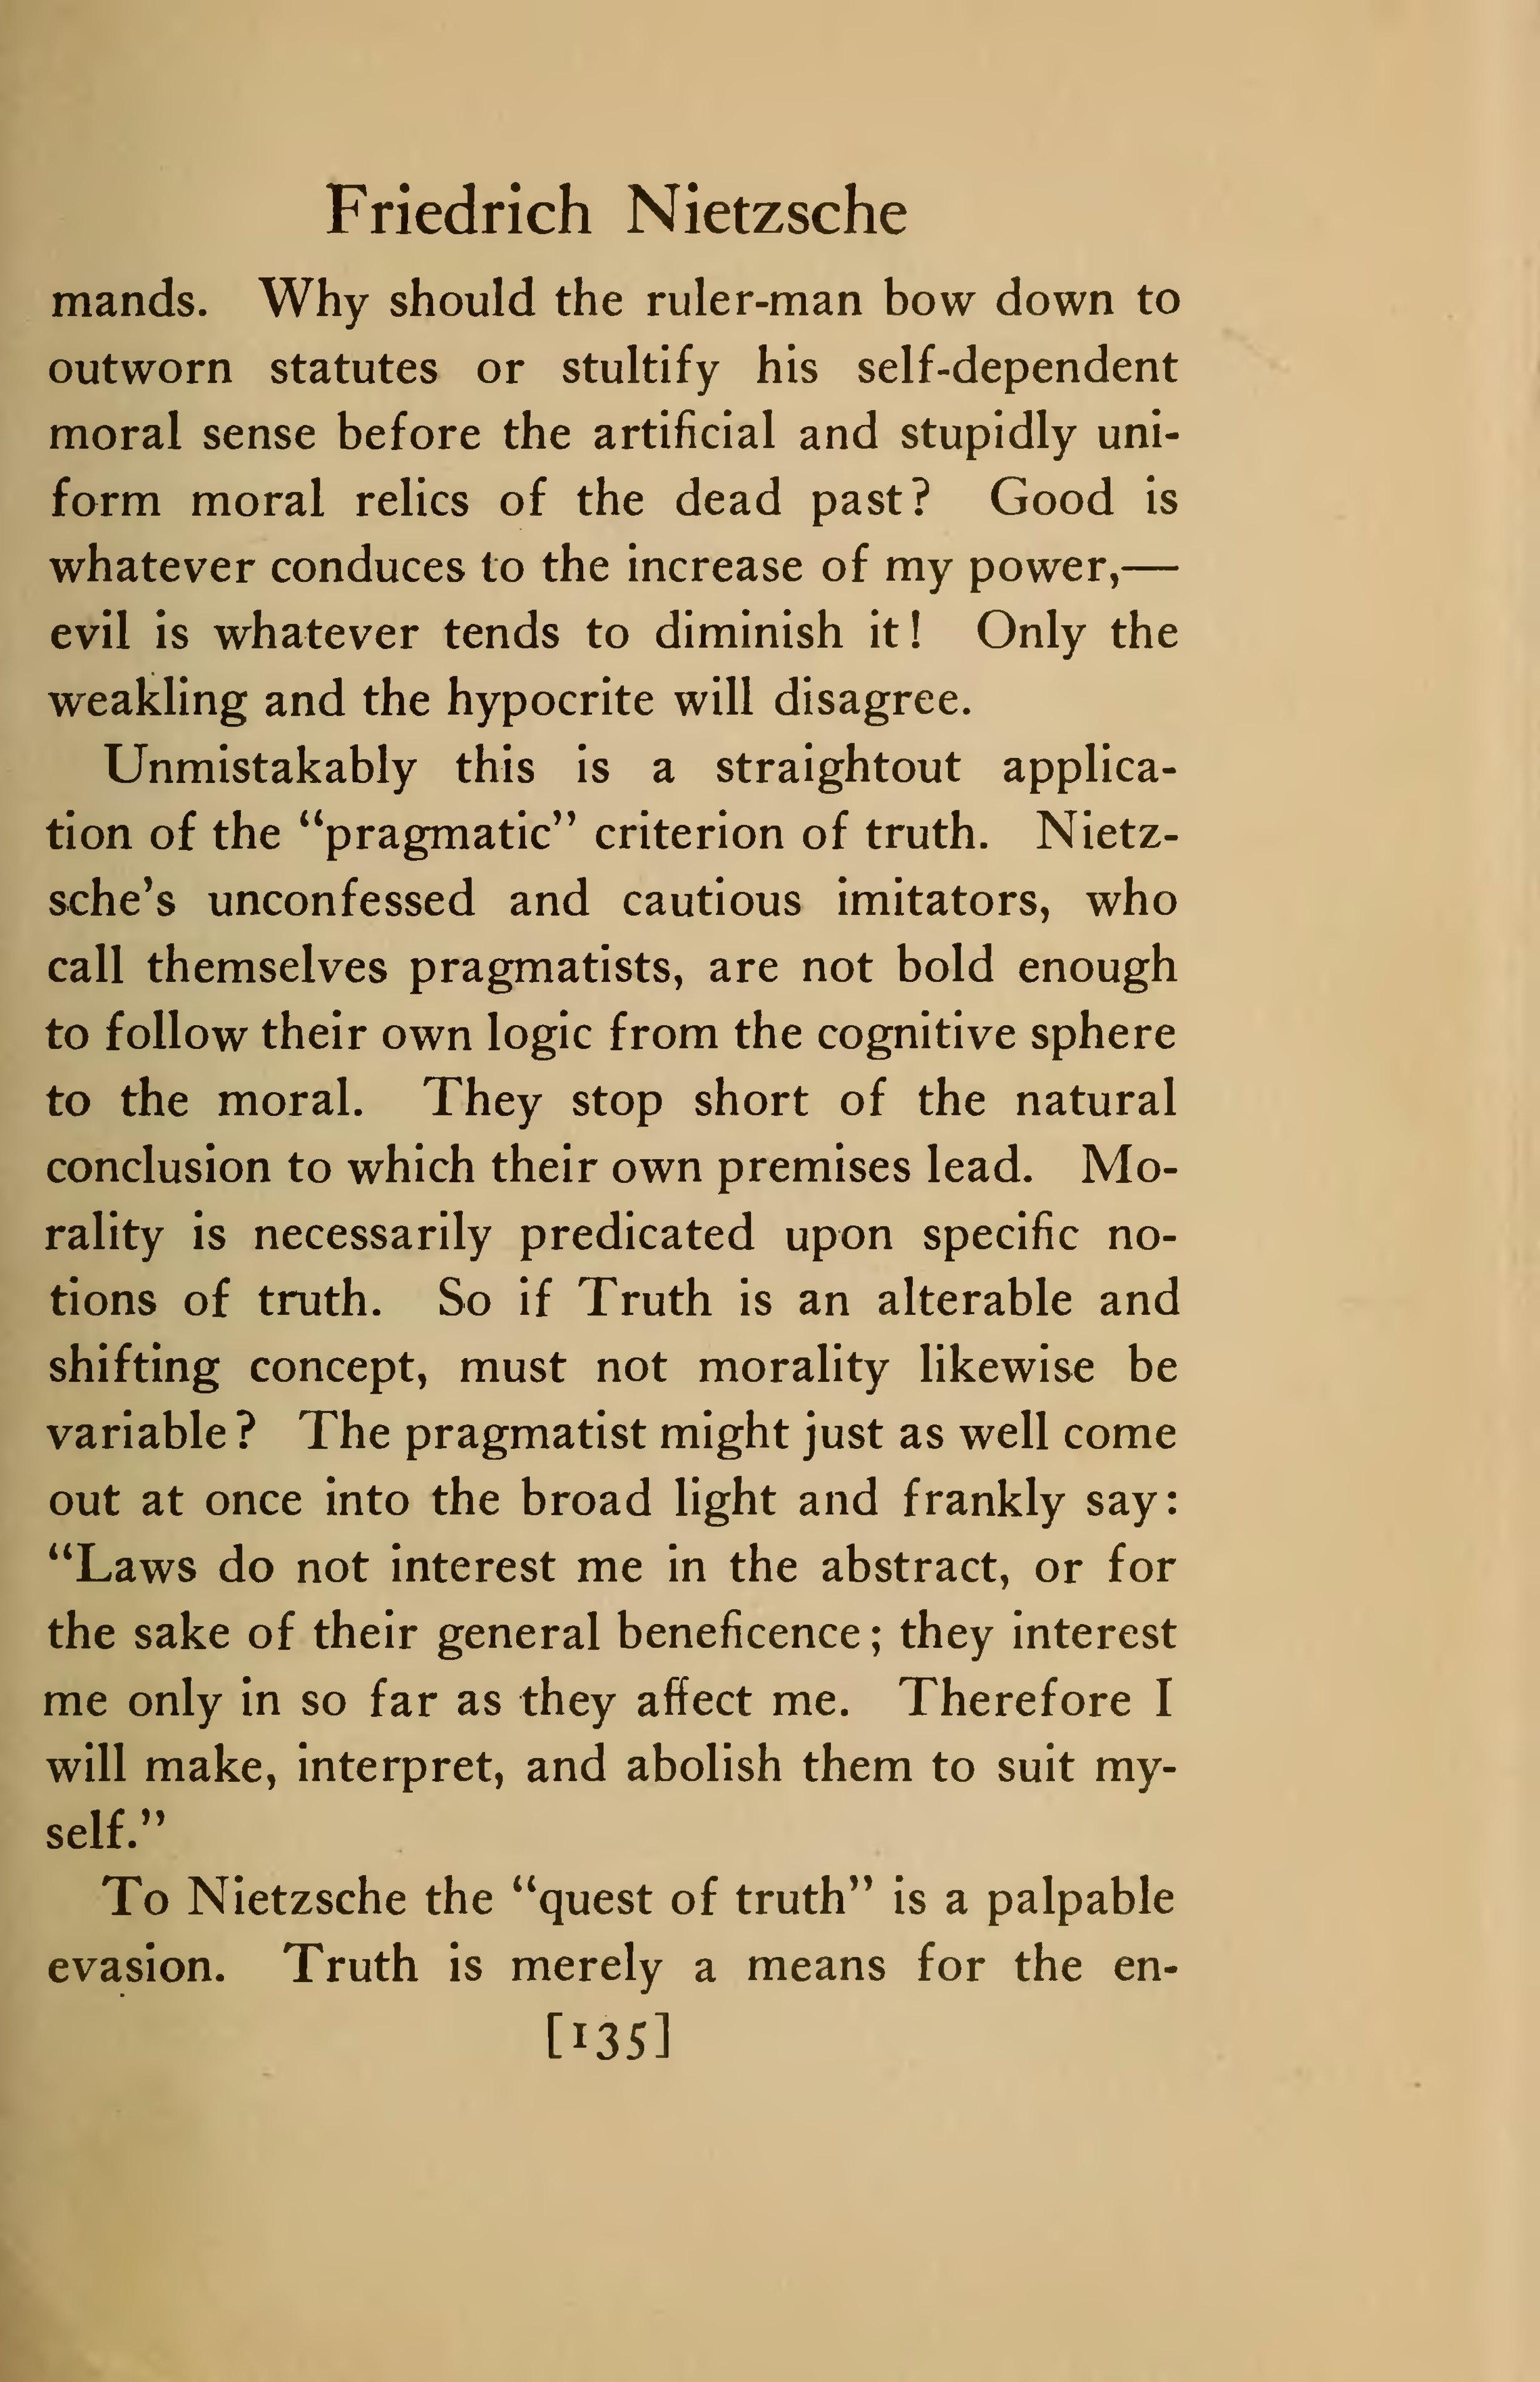 nietzche vs matthew essay An essay concerning theistic understanding: reflections on nietzsche's death of god by matthew fisher.